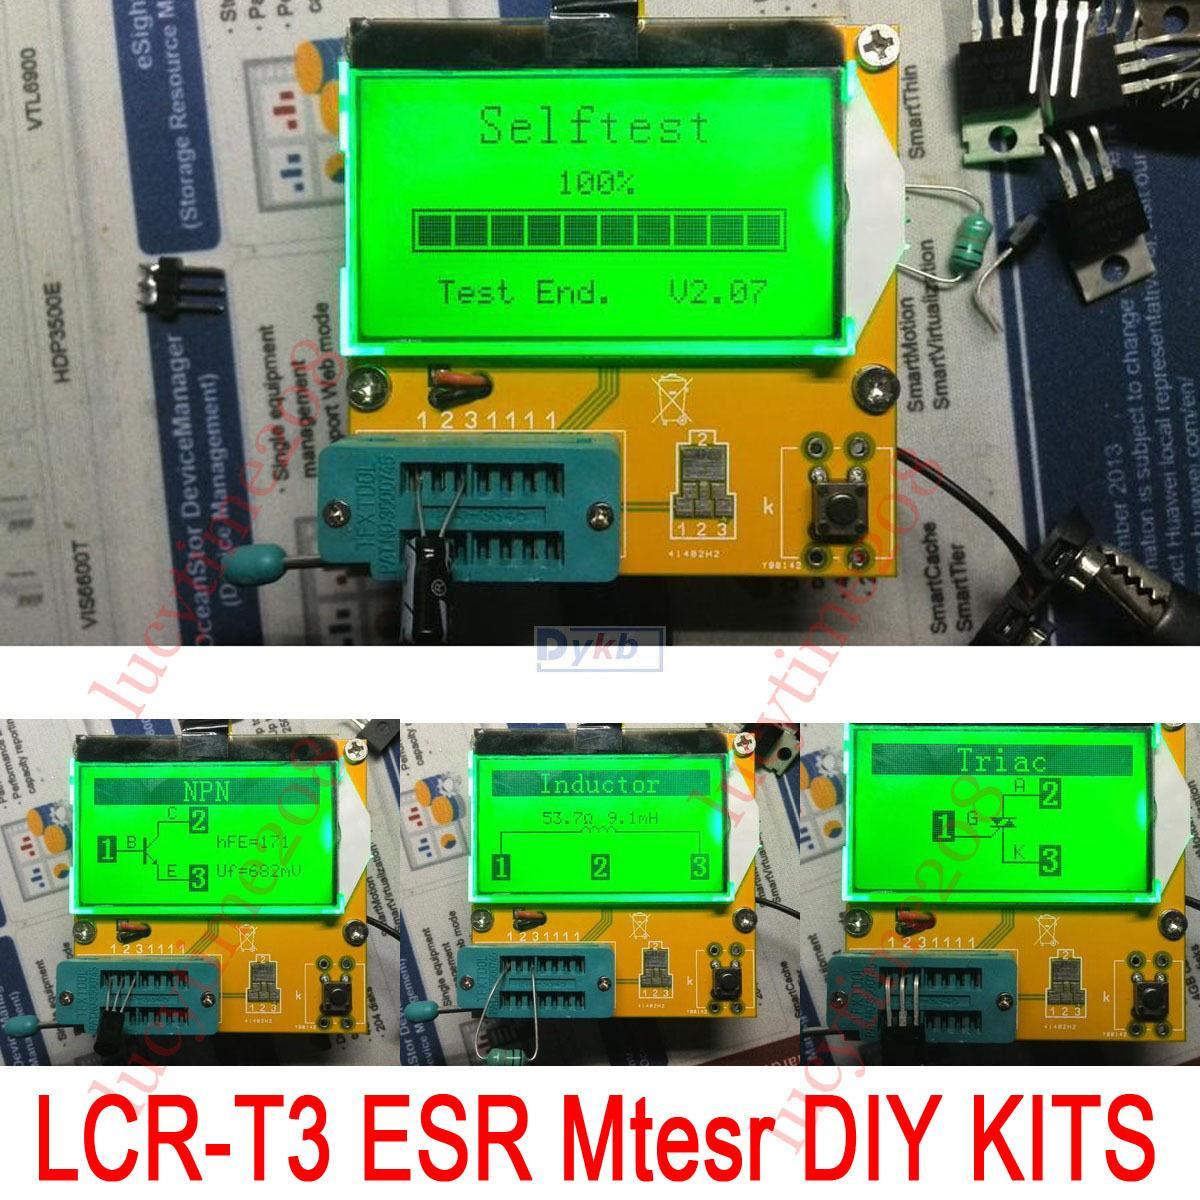 2018 Diy Kits Lcr T3 Mega328 Transistor Tester Diode Triode Thyristor Capacitor Inductance Resistor Scr Esr Meter Mos Pnp Npn From Zhenyuan666